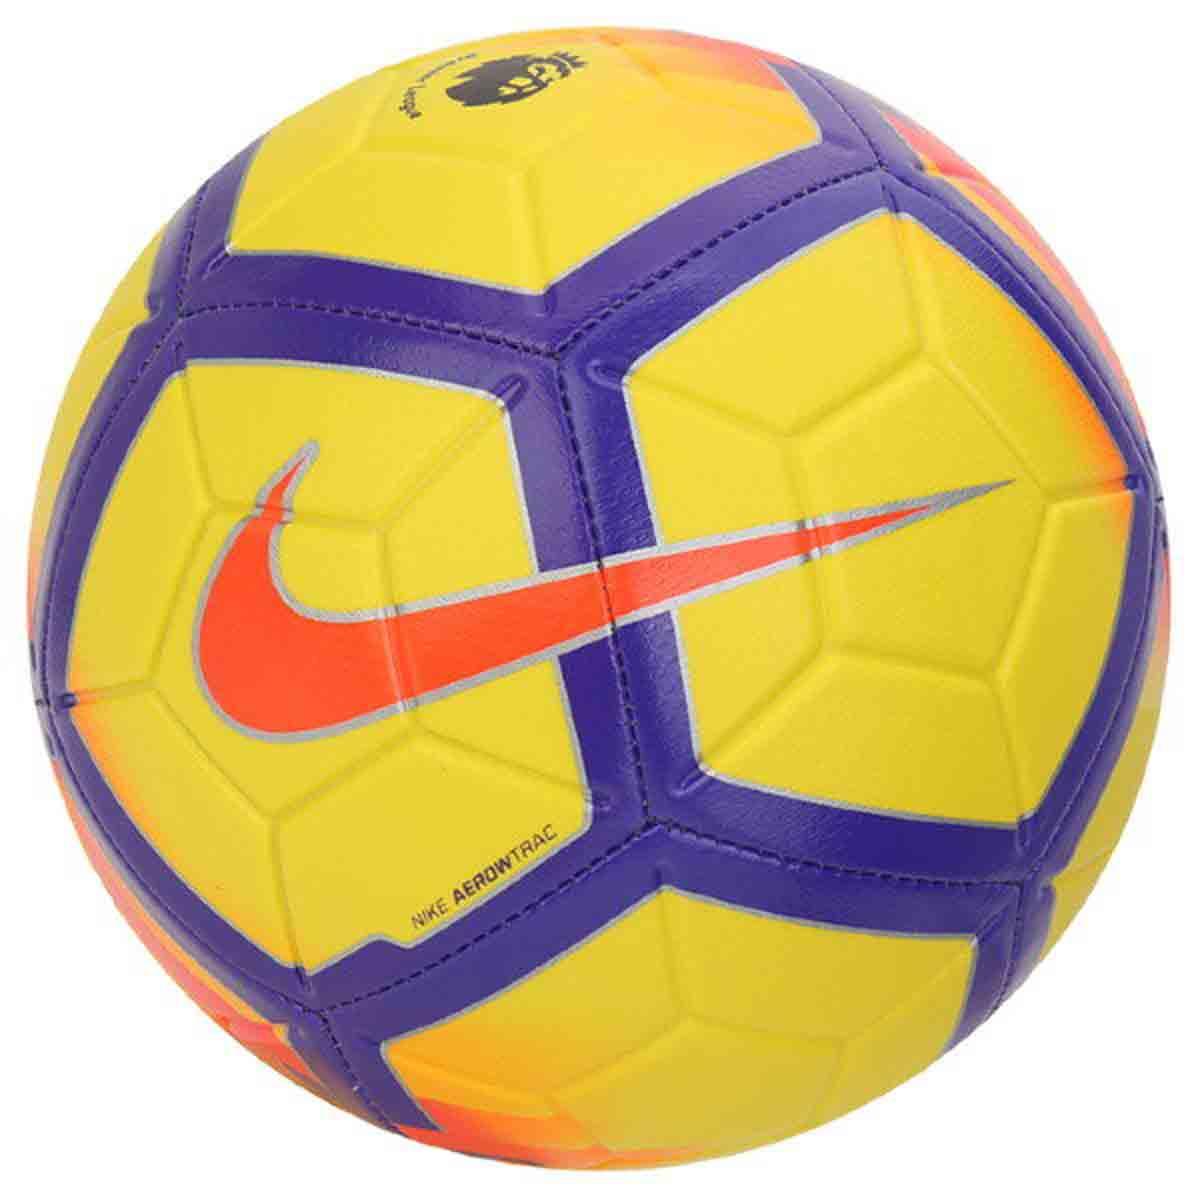 8d987d827a Nike Strike Premier League Football (Yellow/Purple)